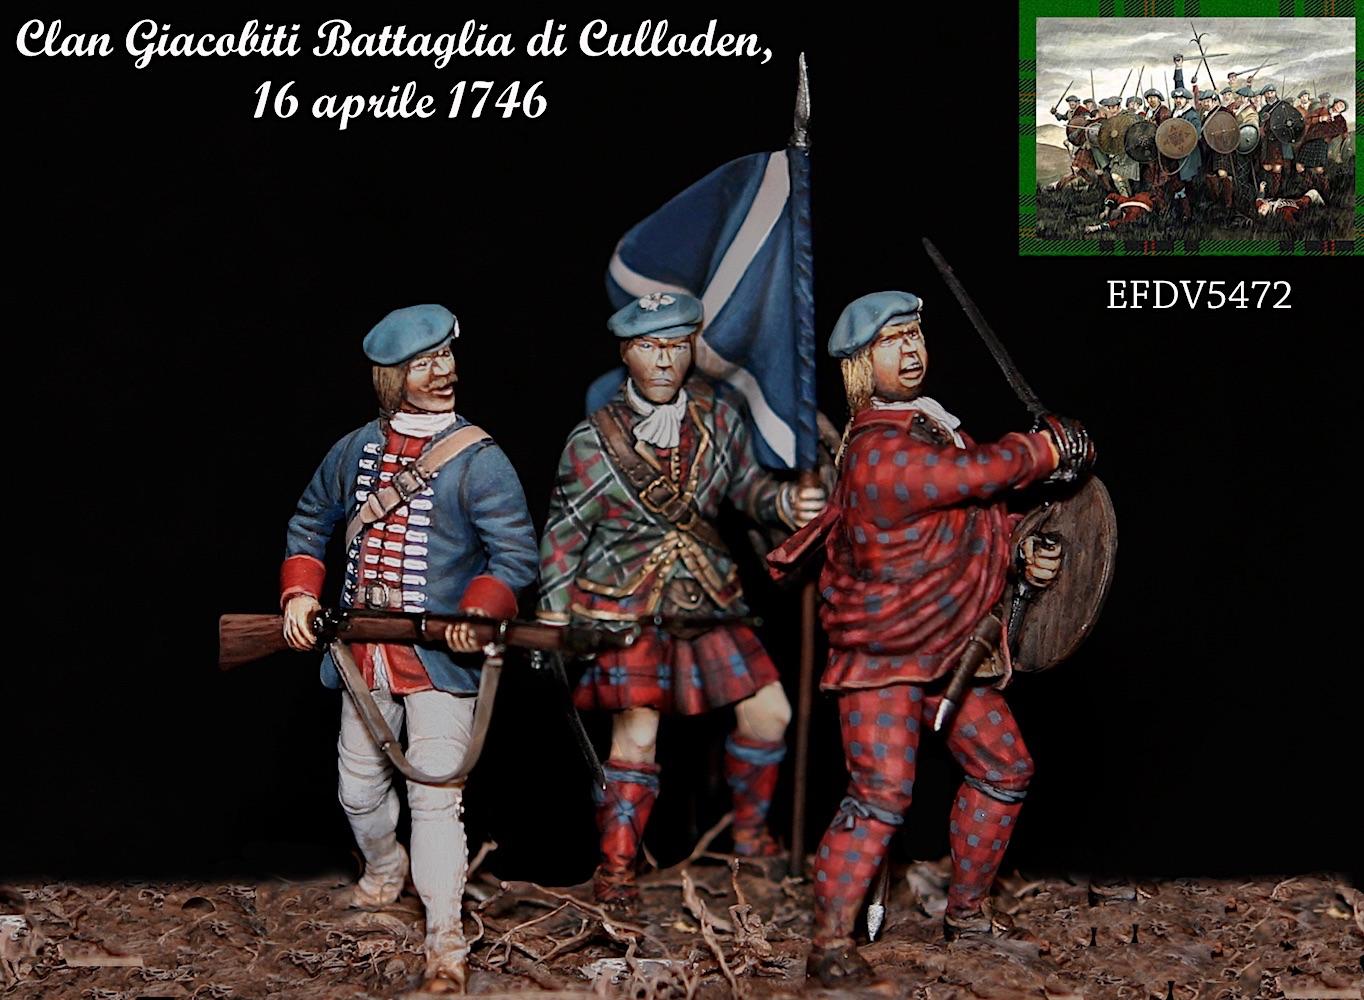 Clan Giacobiti Battaglia di Culloden  16 aprile 1746